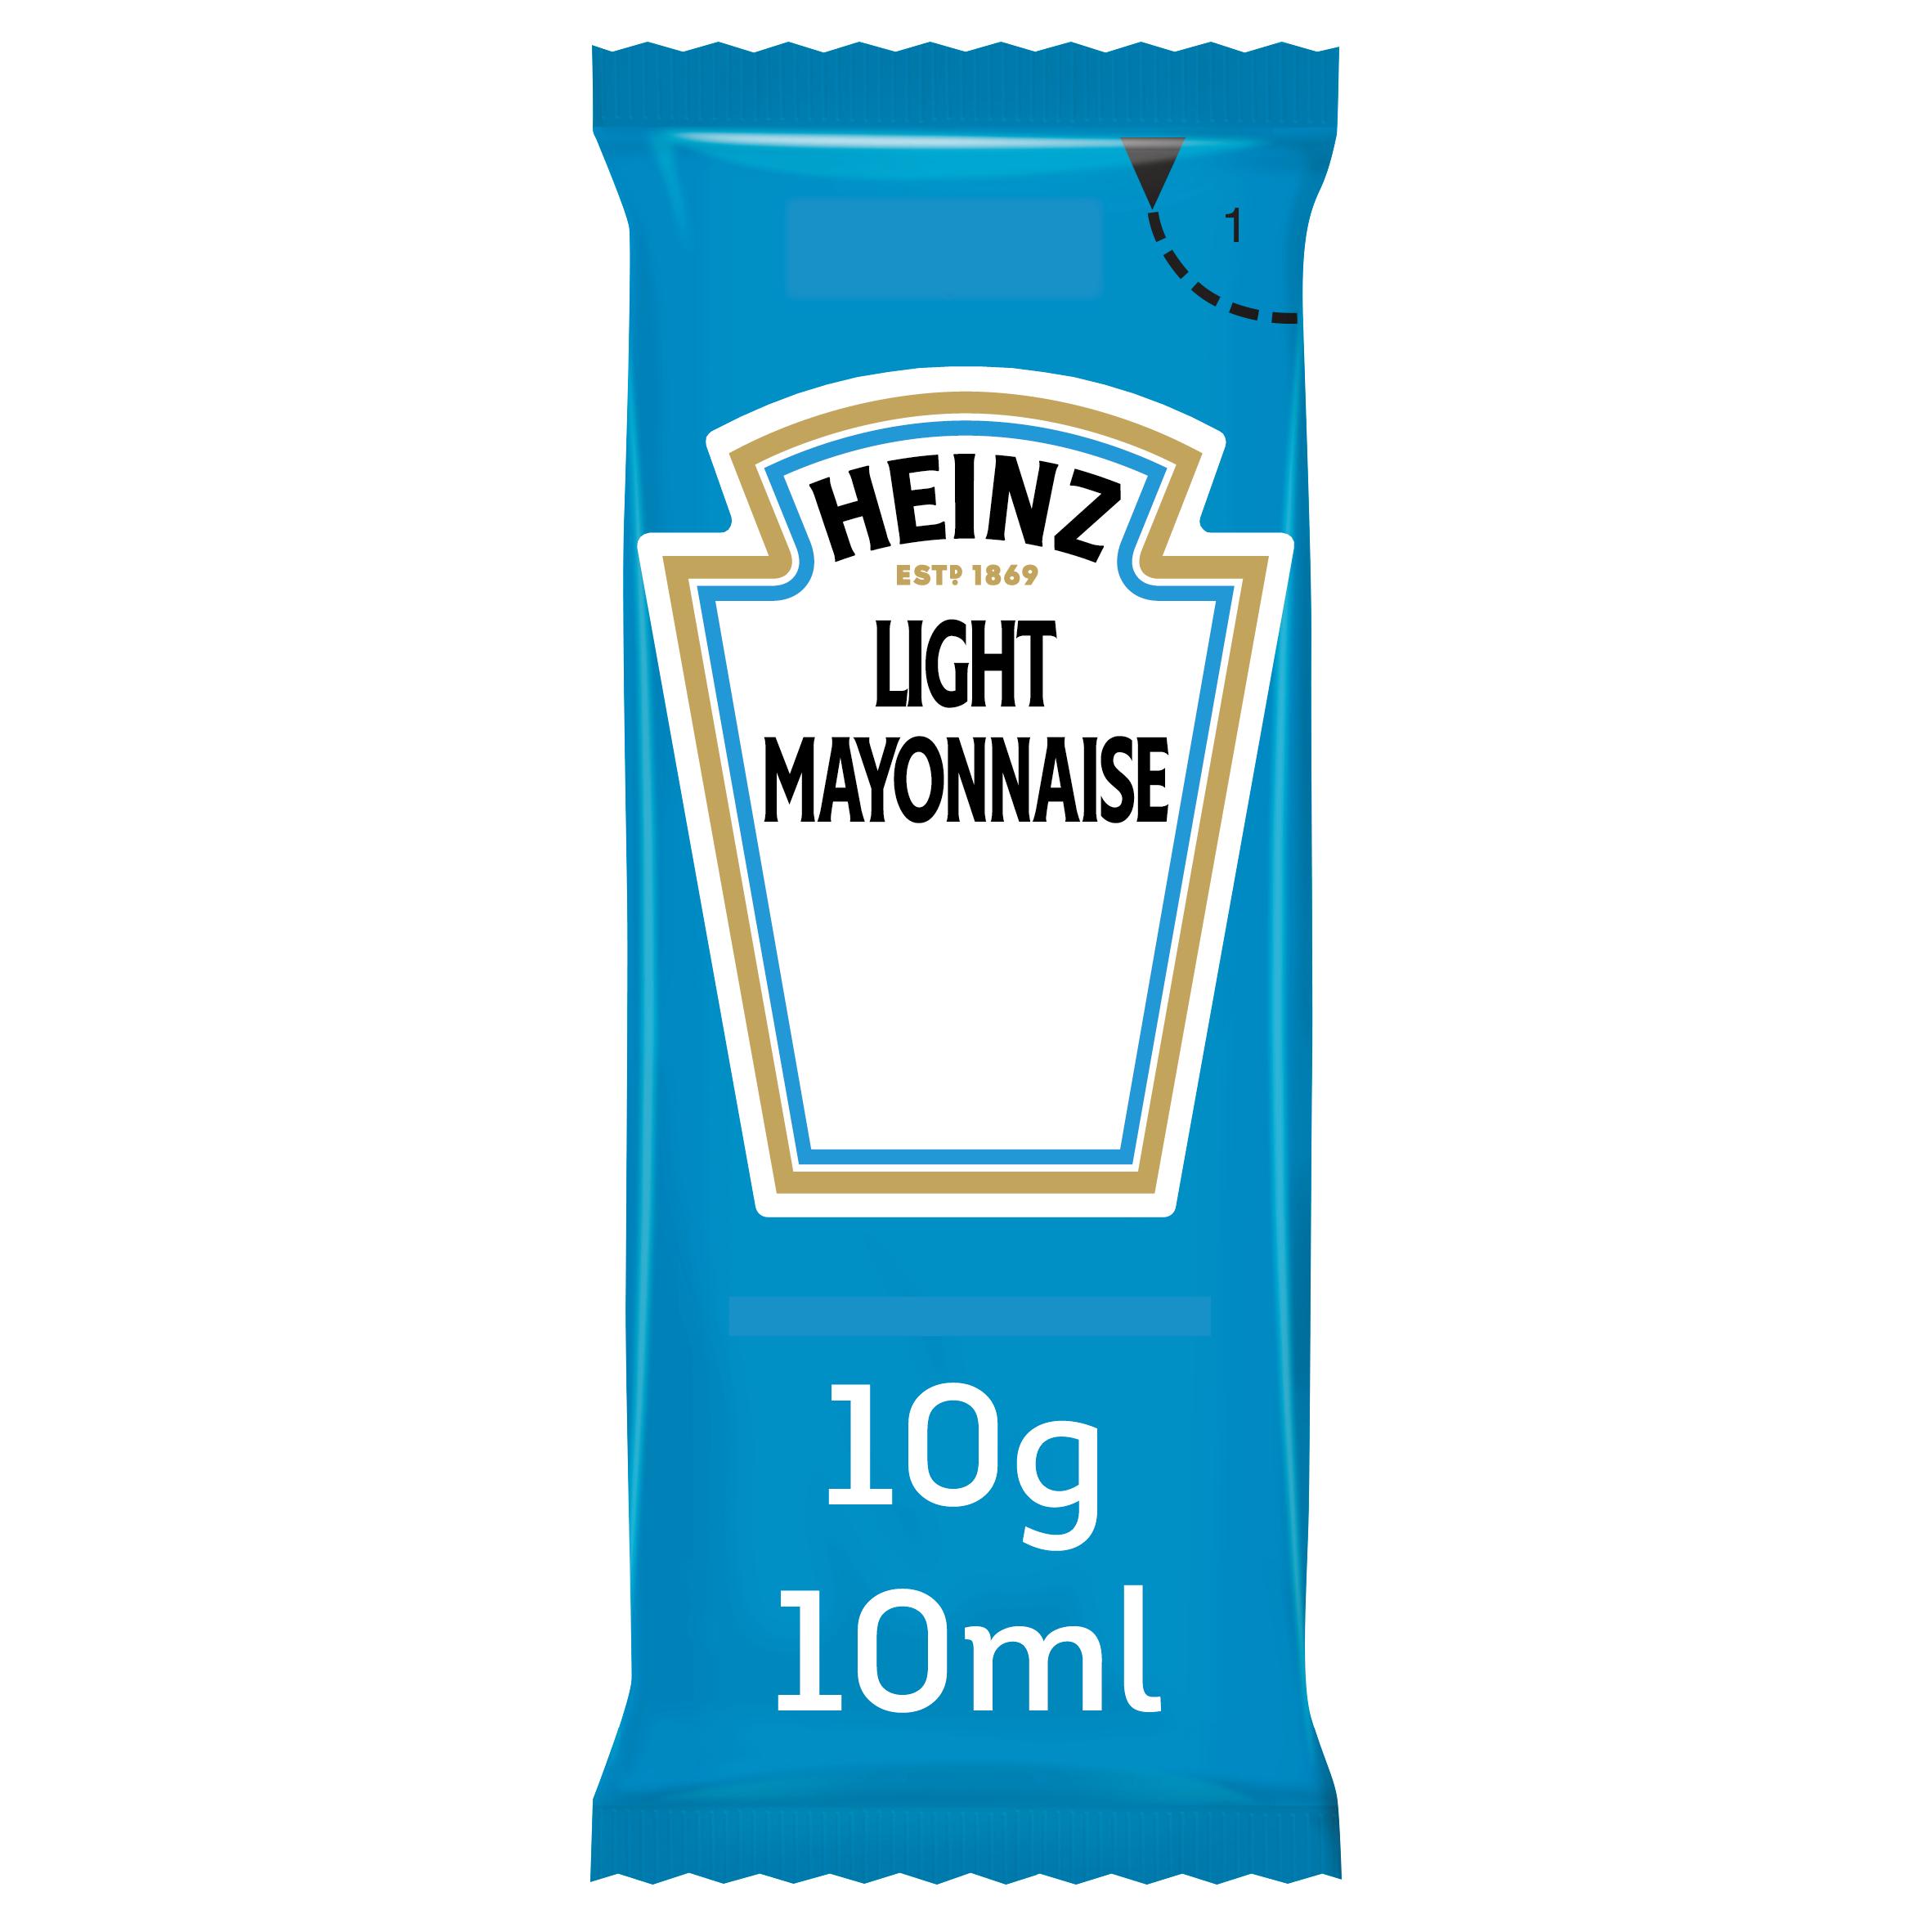 Heinz Mayonnaise Light 10ml Sachet image